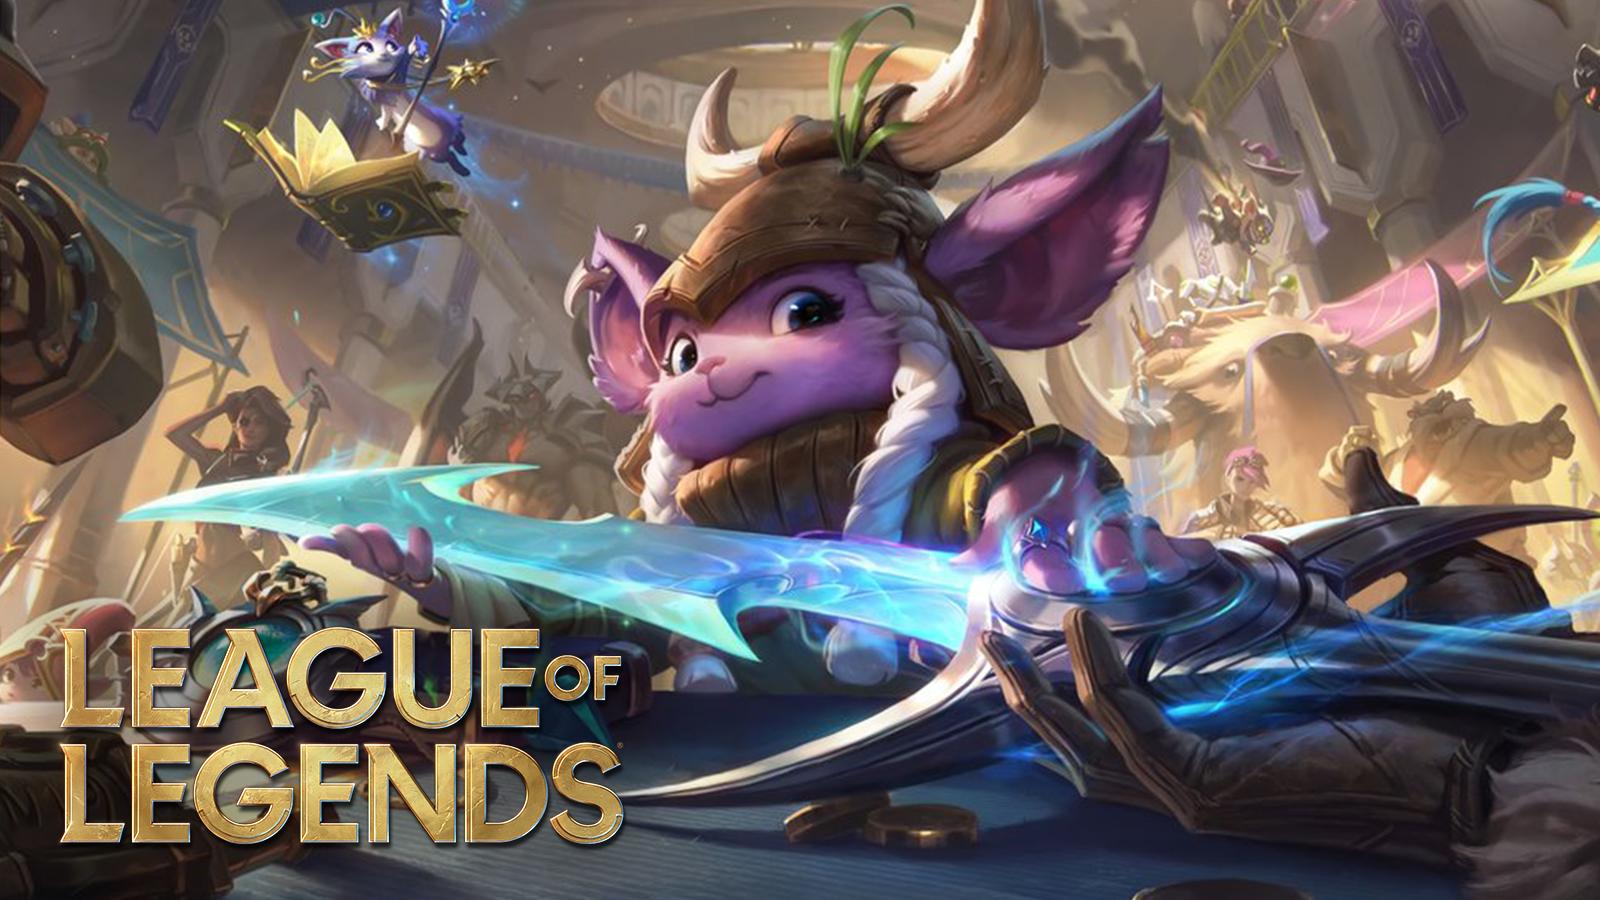 League of Legends shopkeeper welcomes in Season 11 in patch 10.23.